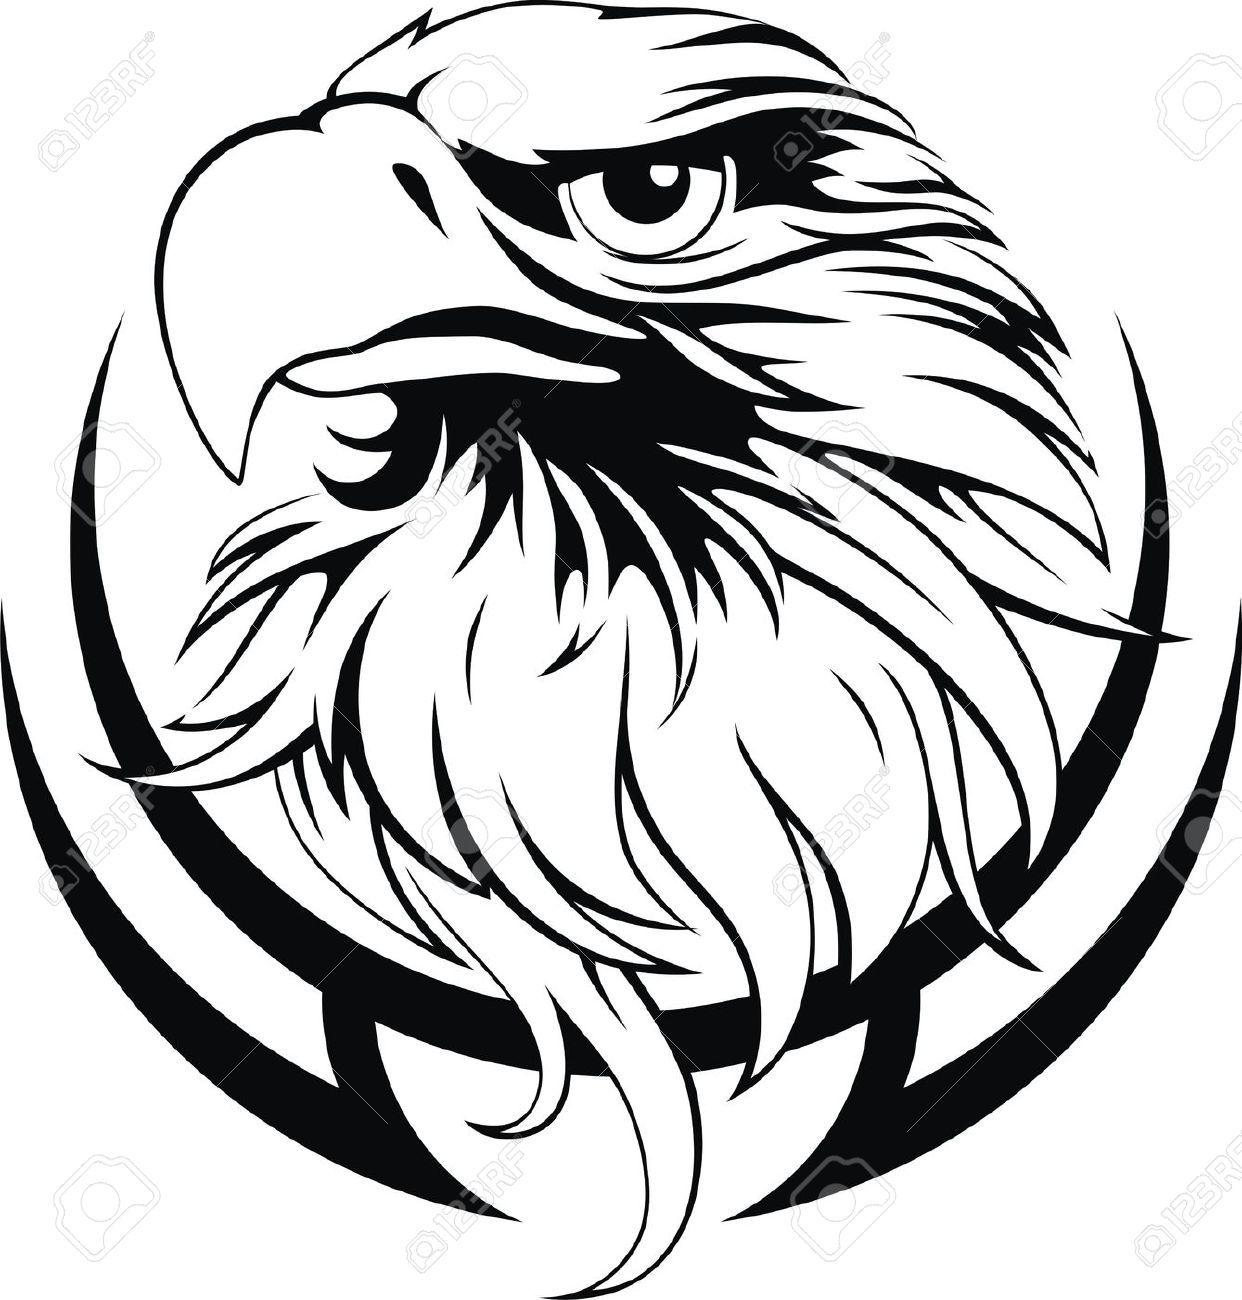 Black Hawk Cliparts, Stock Vector And Royalty Free Black.